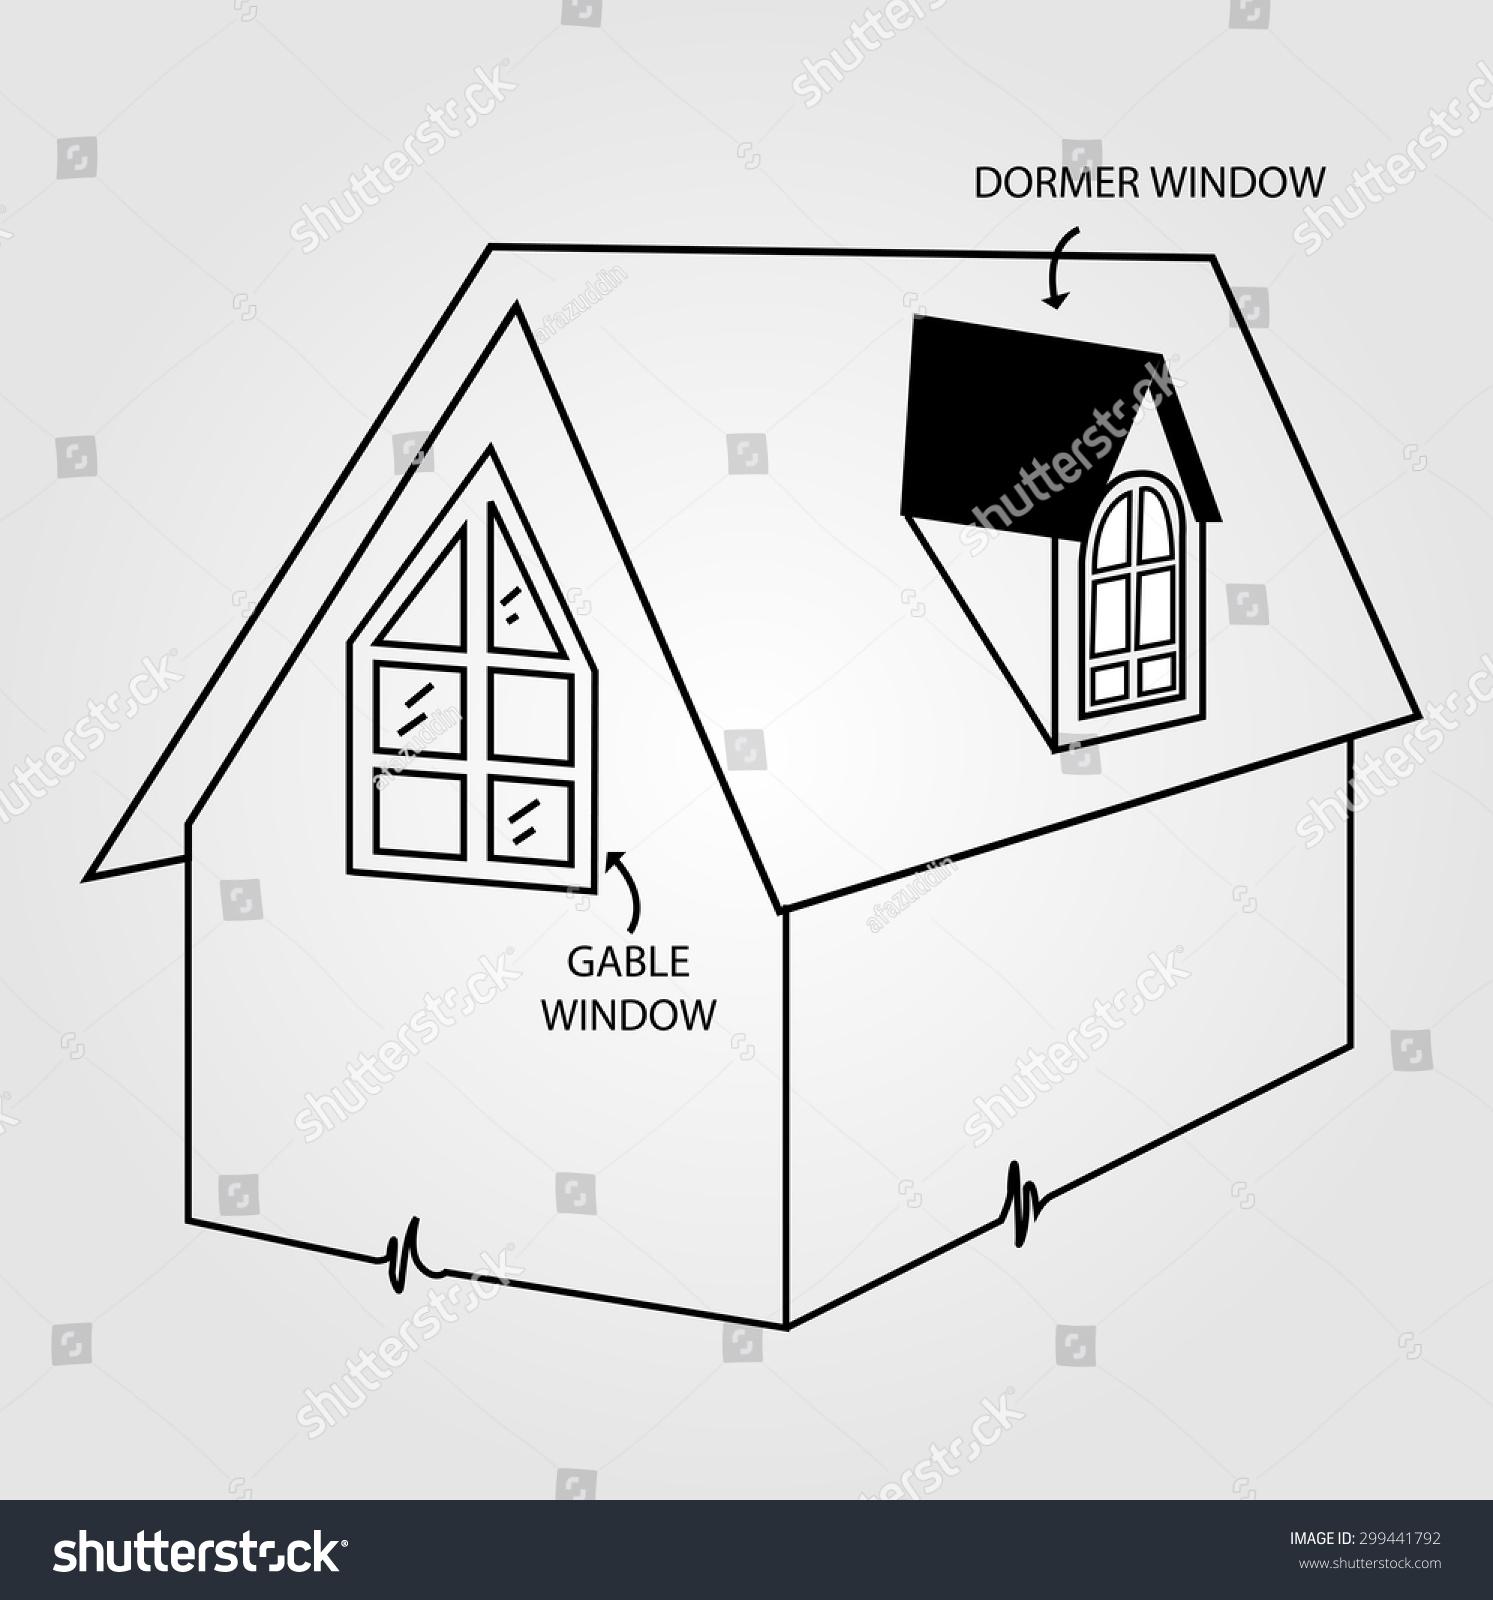 Windows Roof Attic Software Diagram Radio Wiring Diagrams Dormer Gable Window Stock Vector Royalty Free 299441792 Rh Shutterstock Com Ventilation Framing